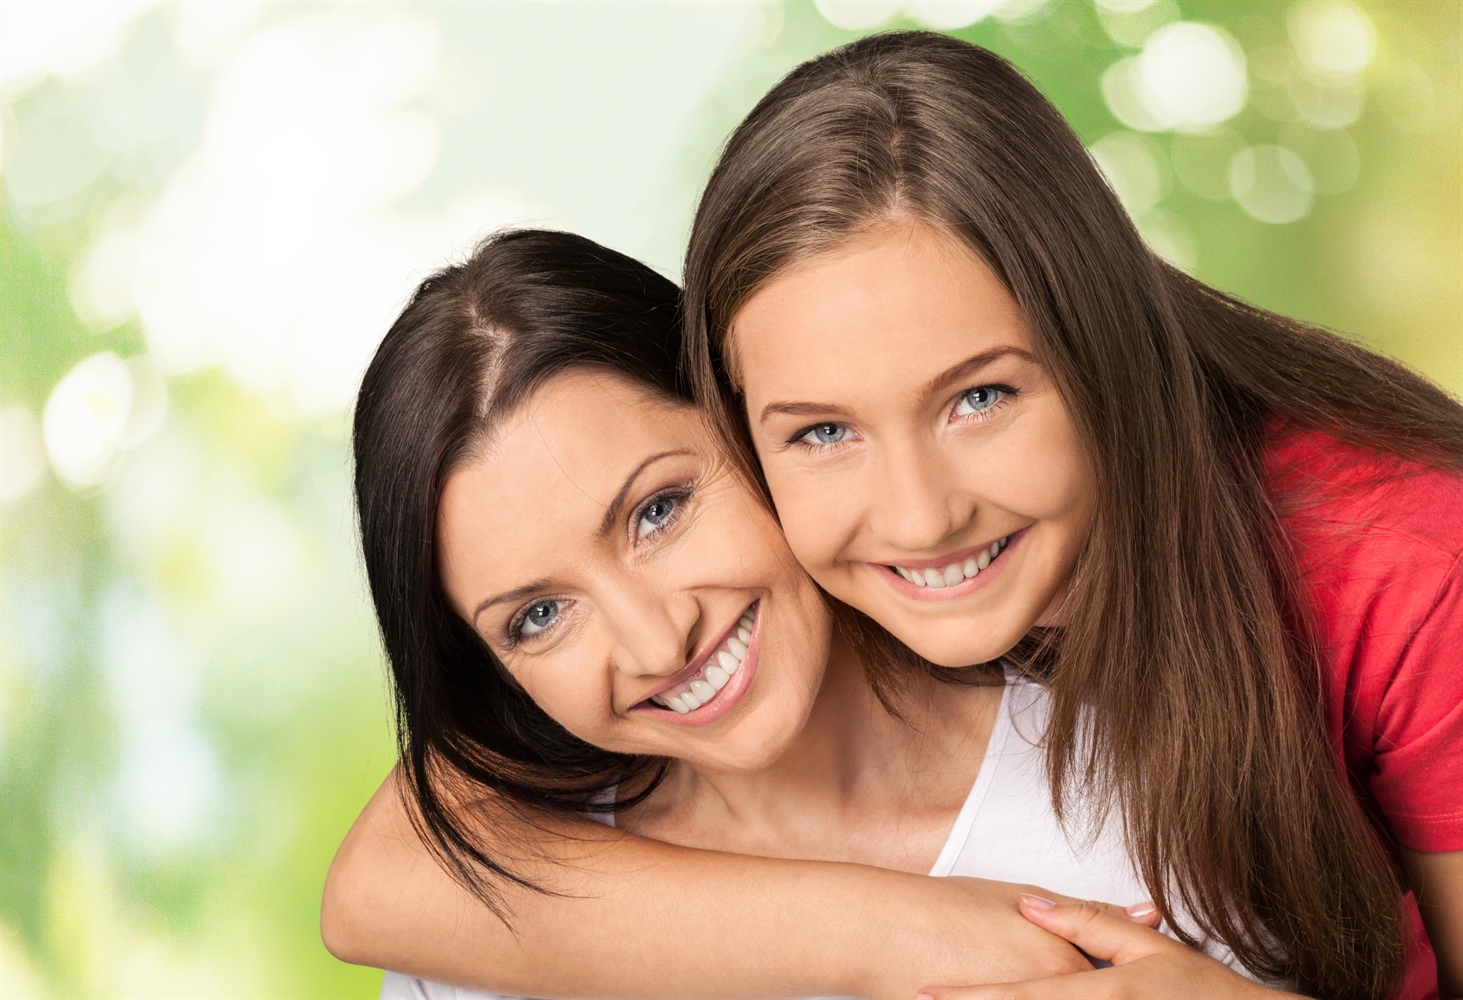 femmes qui sourient